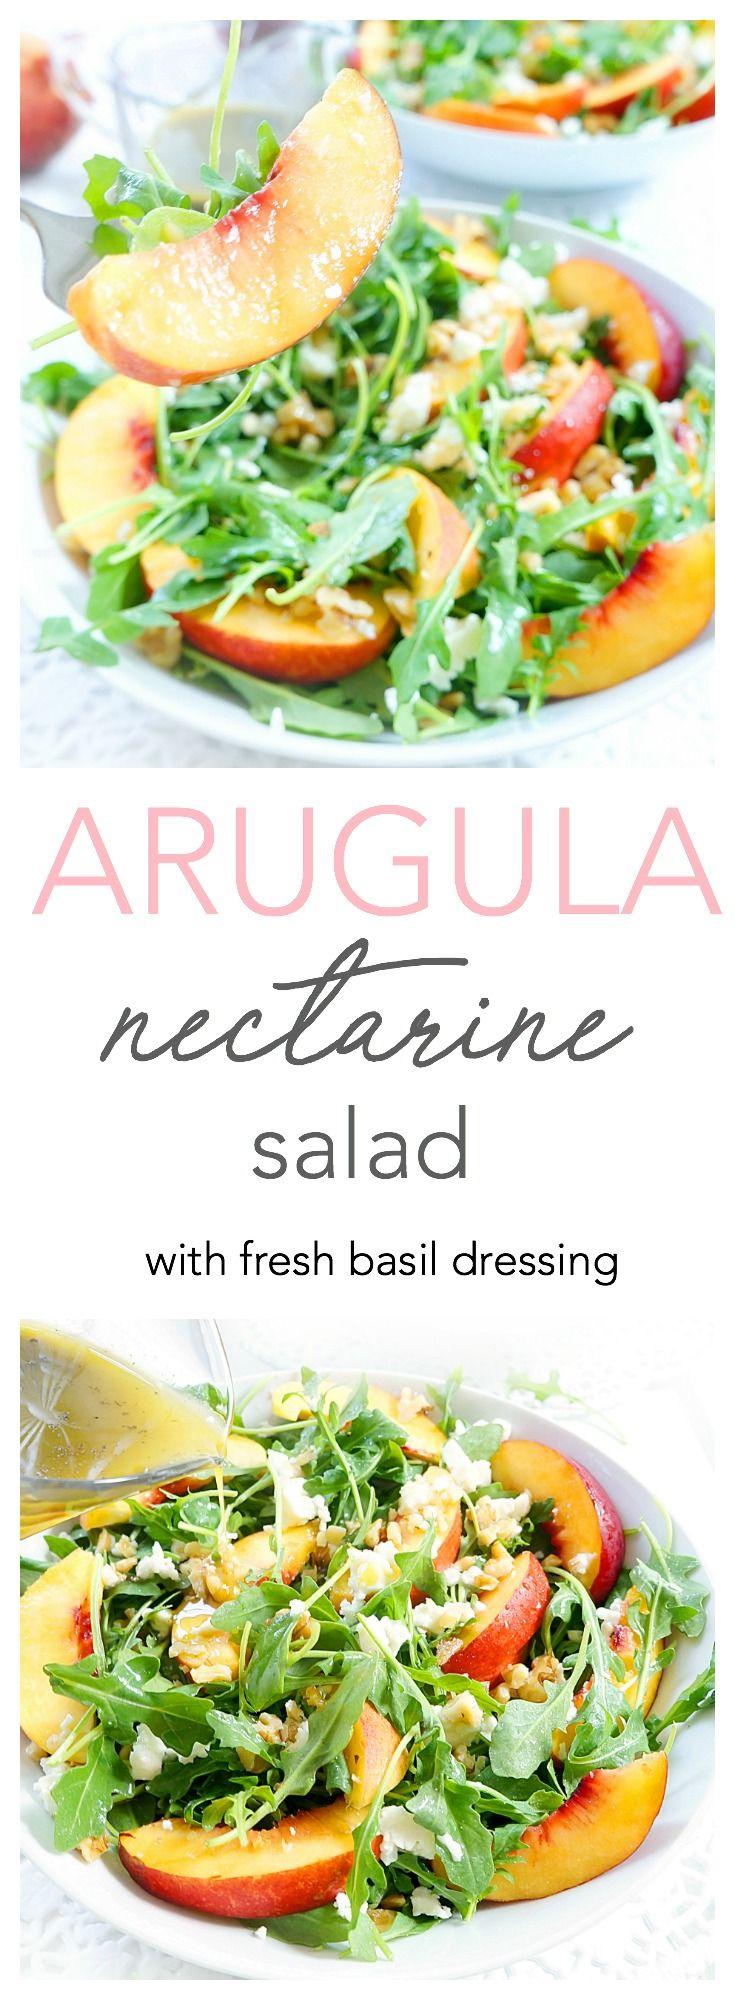 Arugula & Nectarine Salad #healthyliving